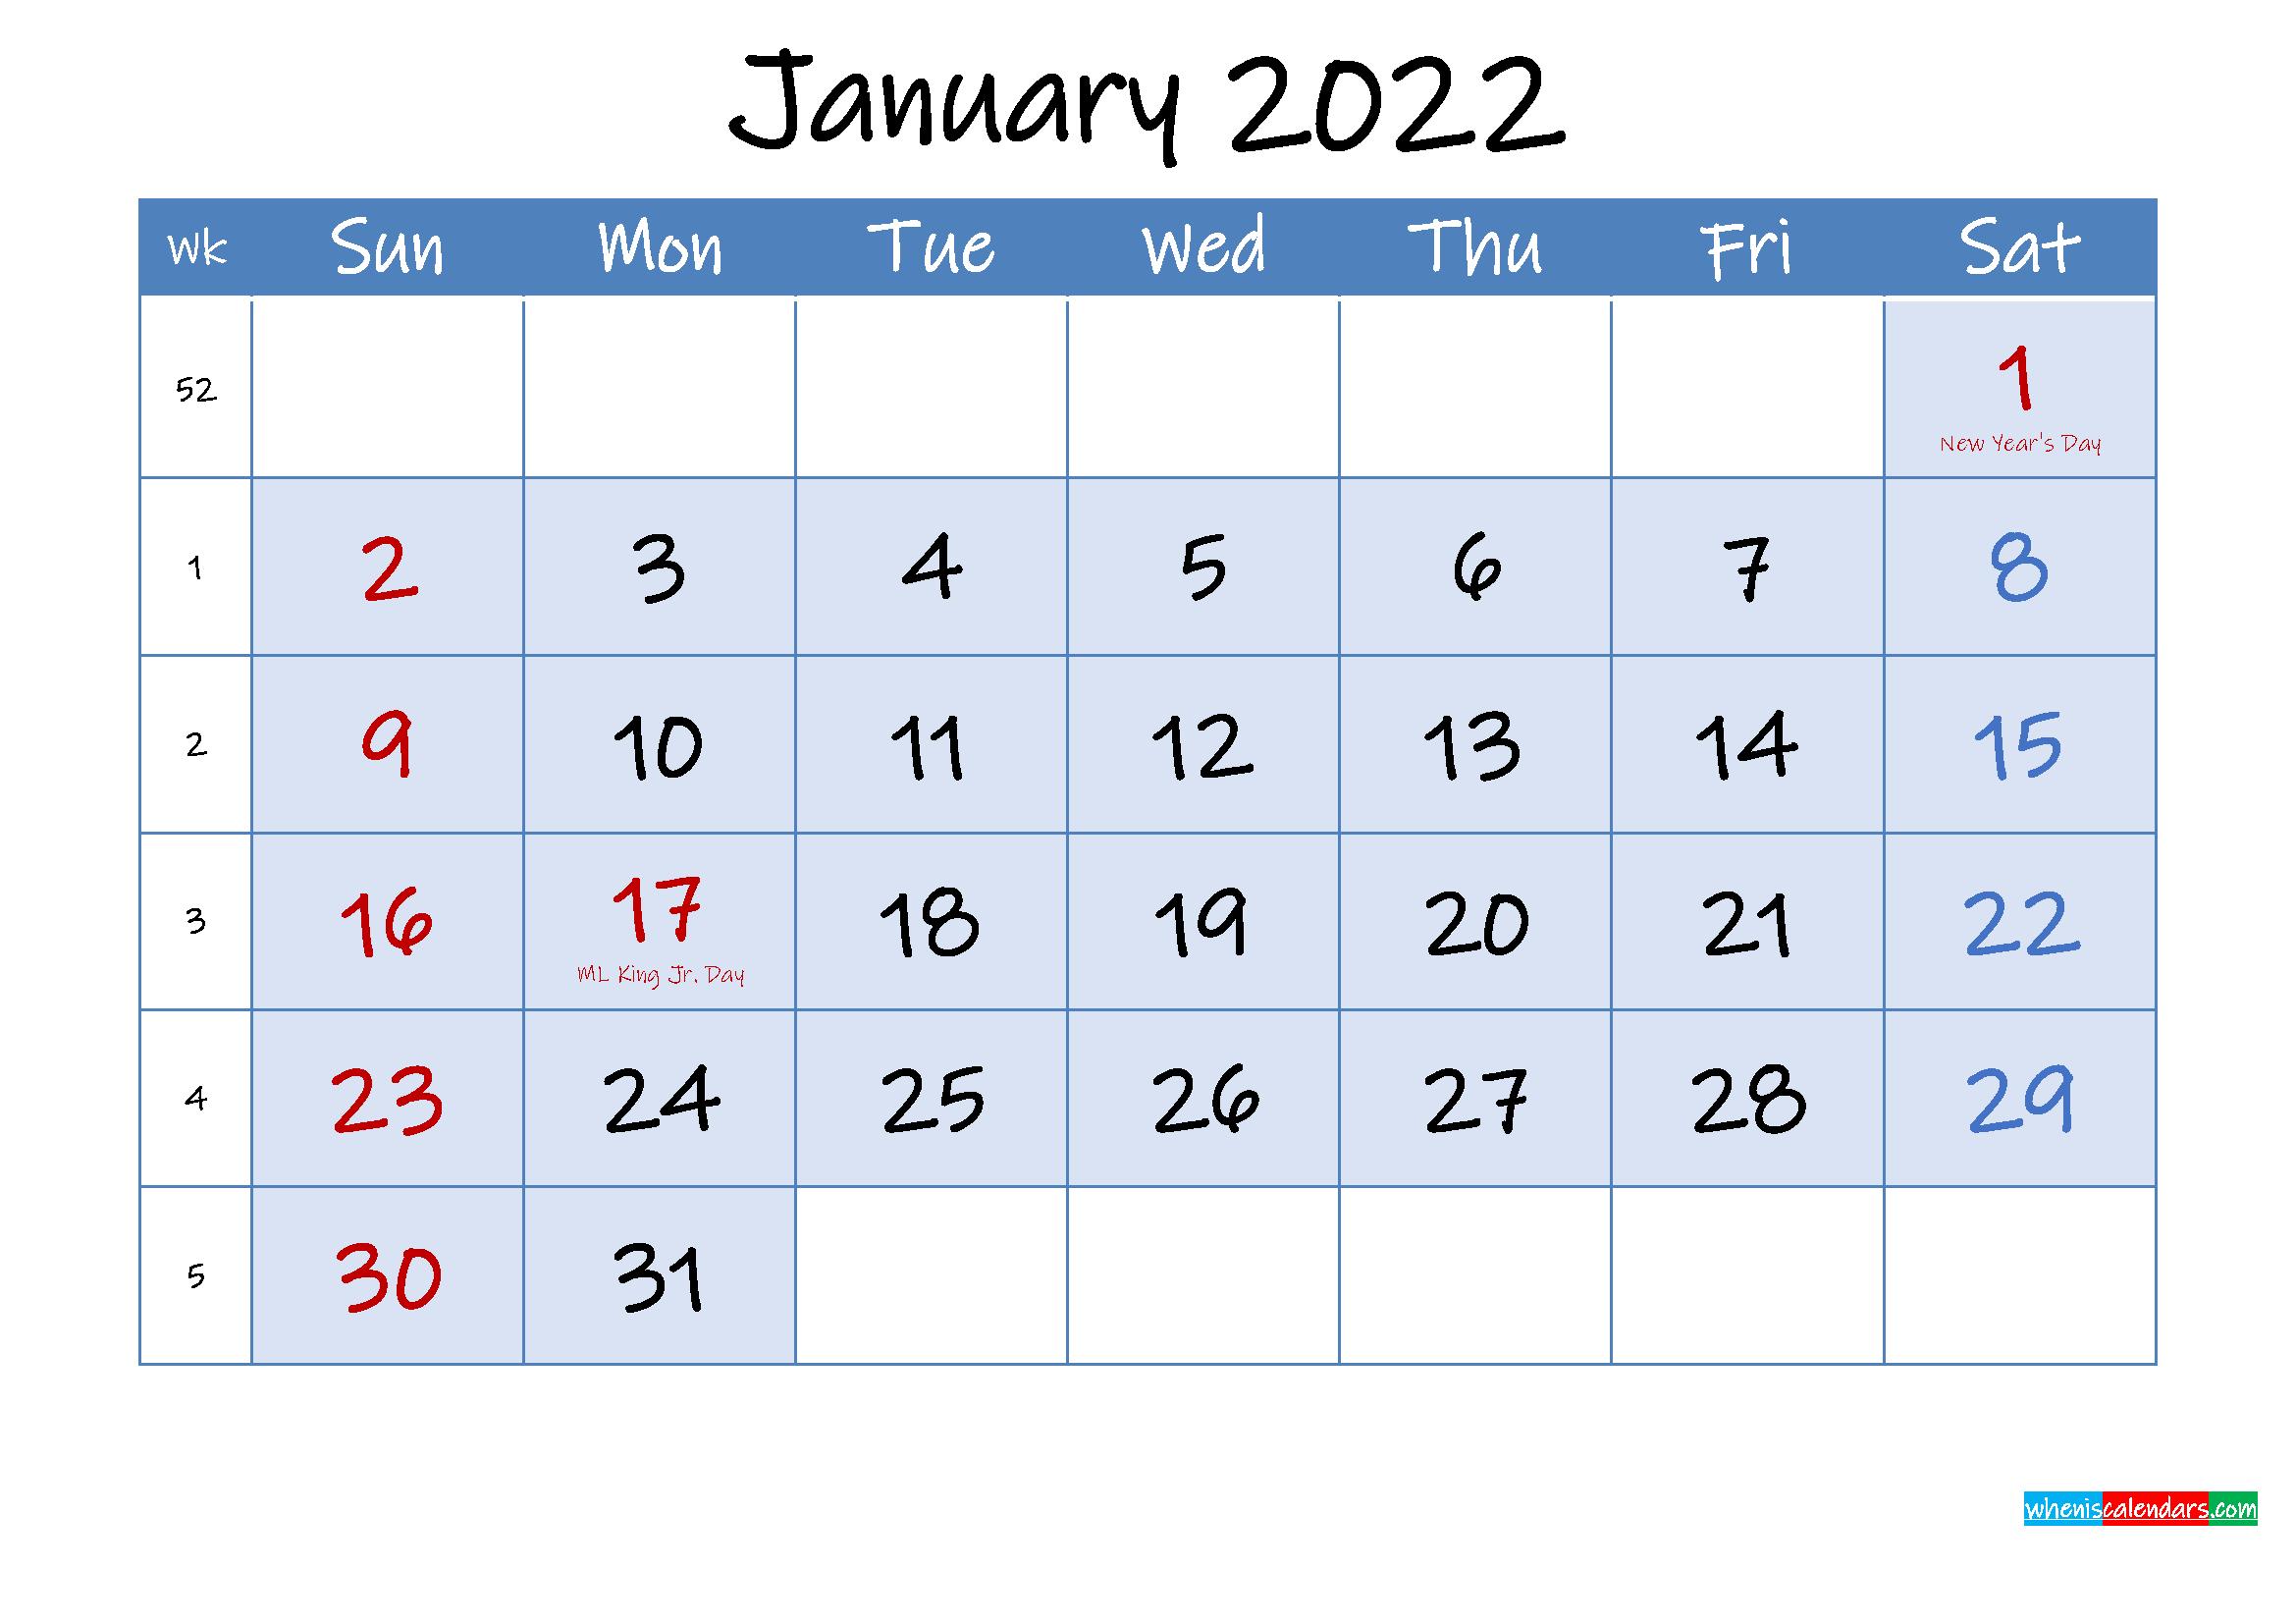 Free Printable January 2022 Calendar - Template Ink22M97 inside Printable Calendar January 2022 Floral Image